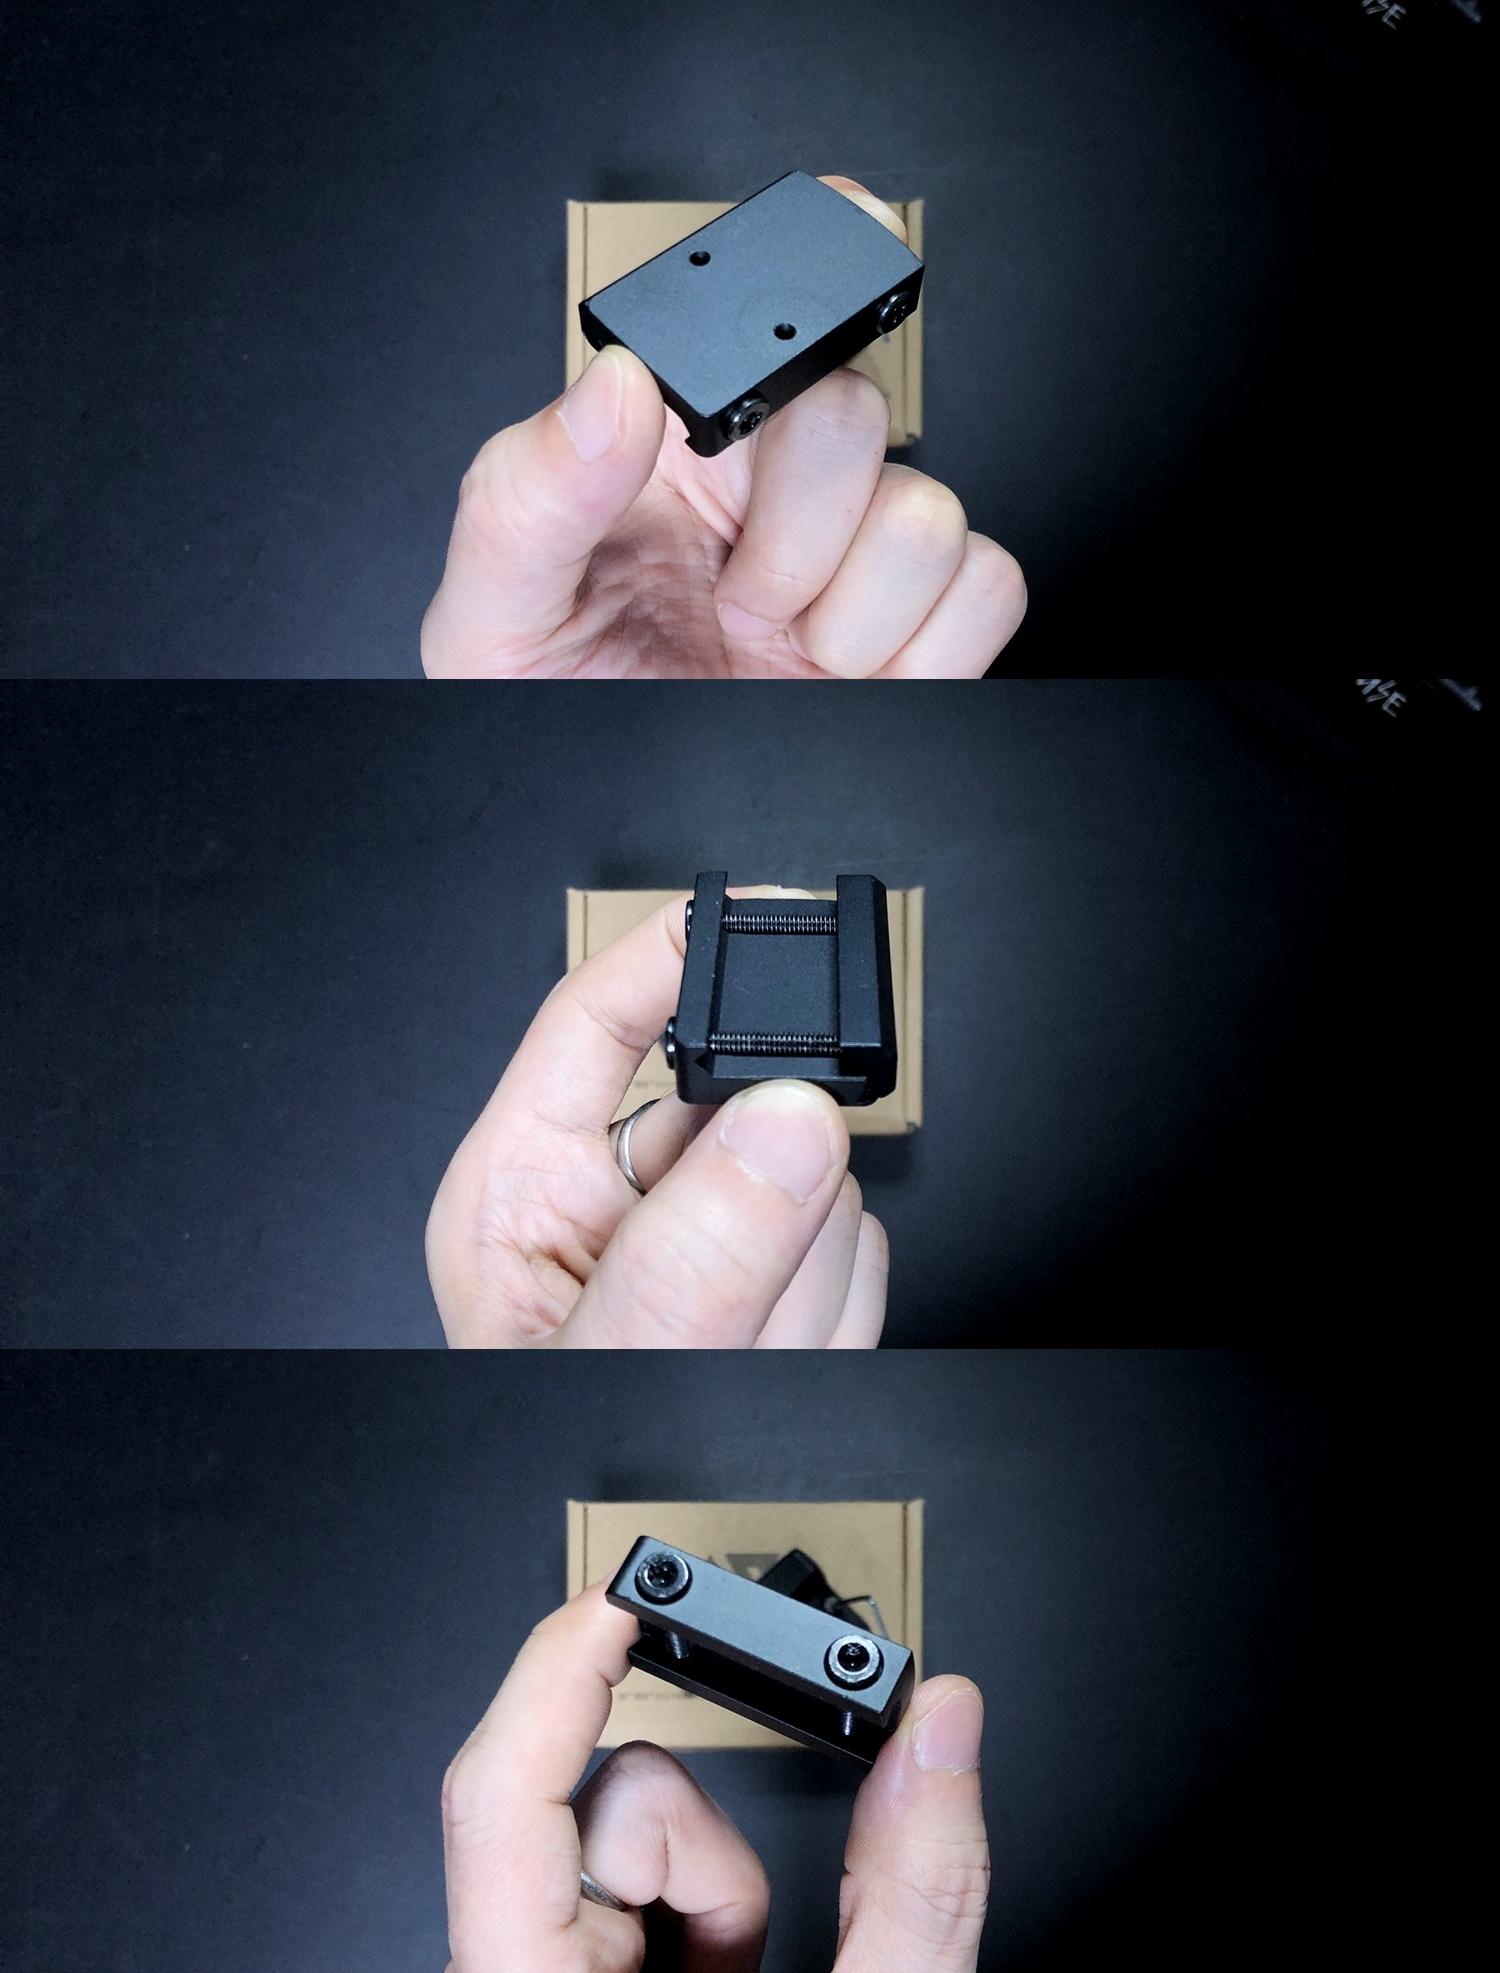 3 HolyWarrior製 RMR Trijicon Type ドットサイト GET!! 噂のHW製 最新 超軽量 複合材質 樹脂 タイプを購入したけど速攻で仲間に奪われました(笑)!! Glock G17 GBB カスタム!! 購入 開封 取付 加工 レビュー!!